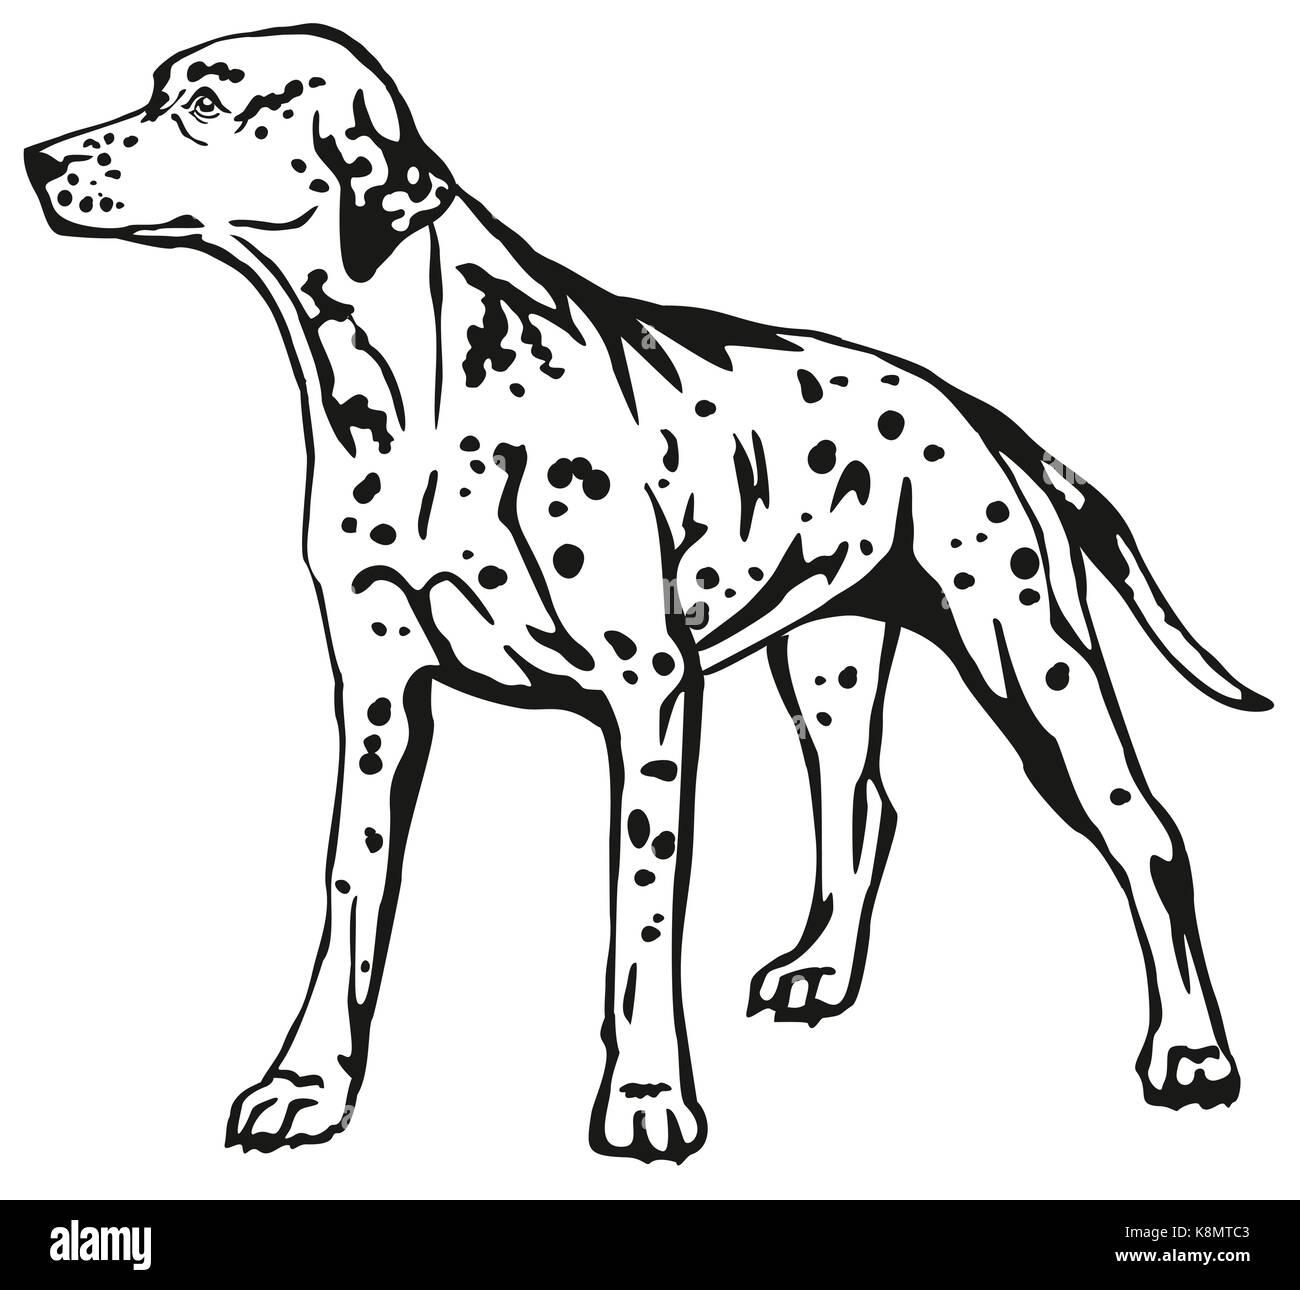 Decorative contour portrait of standing in profile Dalmatian, vector isolated illustration in black color on white - Stock Vector